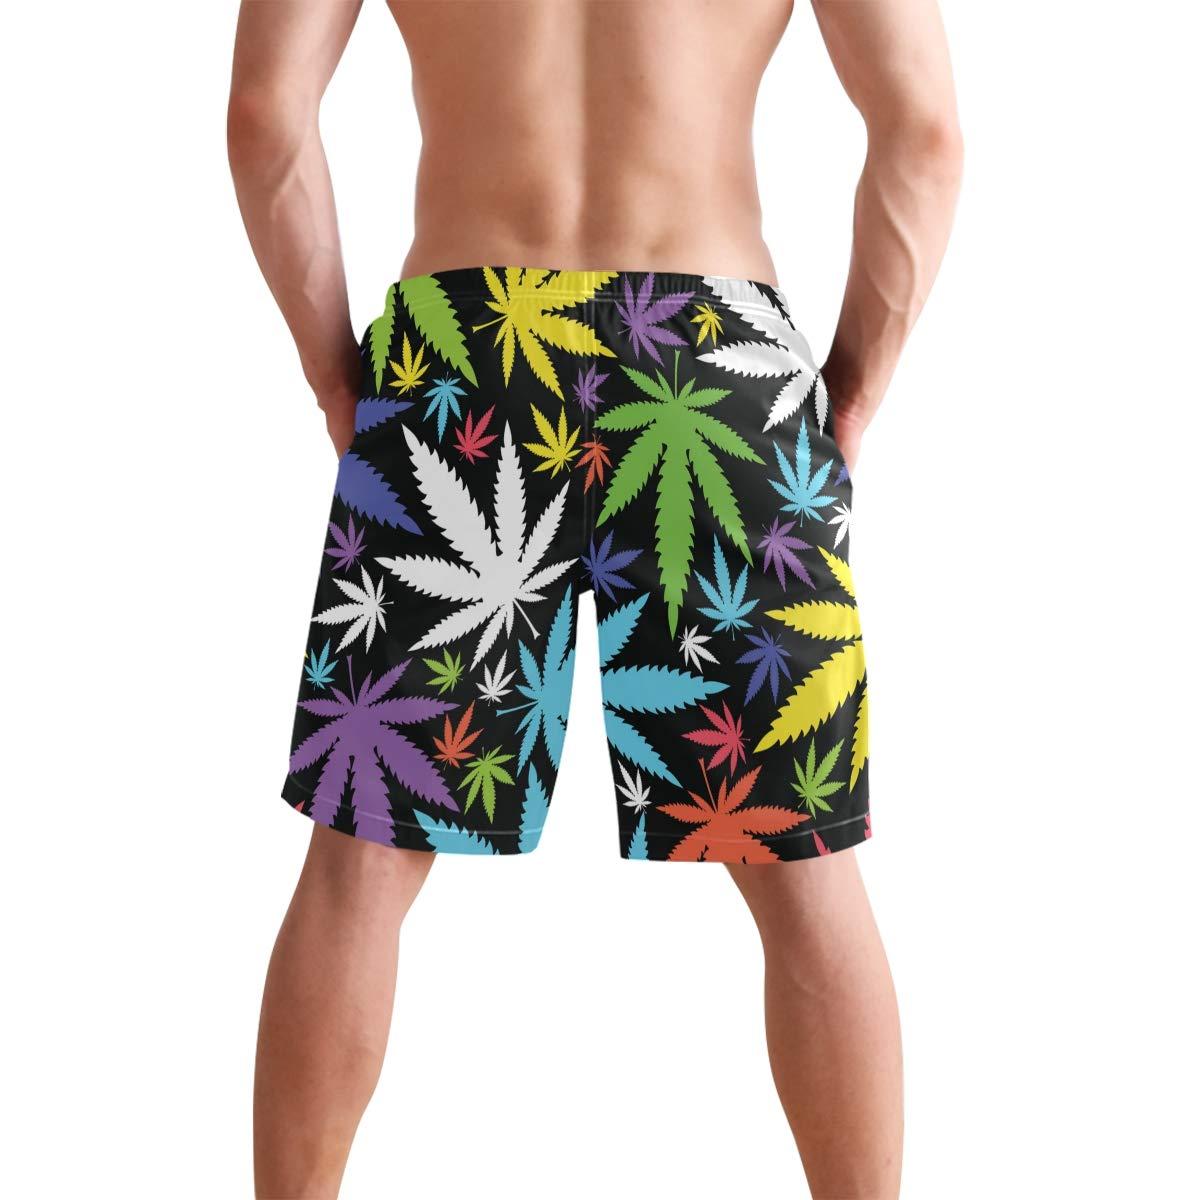 WIHVE Mens Swim Trunks Colorful Marijuana Leaves Quick Dry Beach Board Short with Mesh Lining